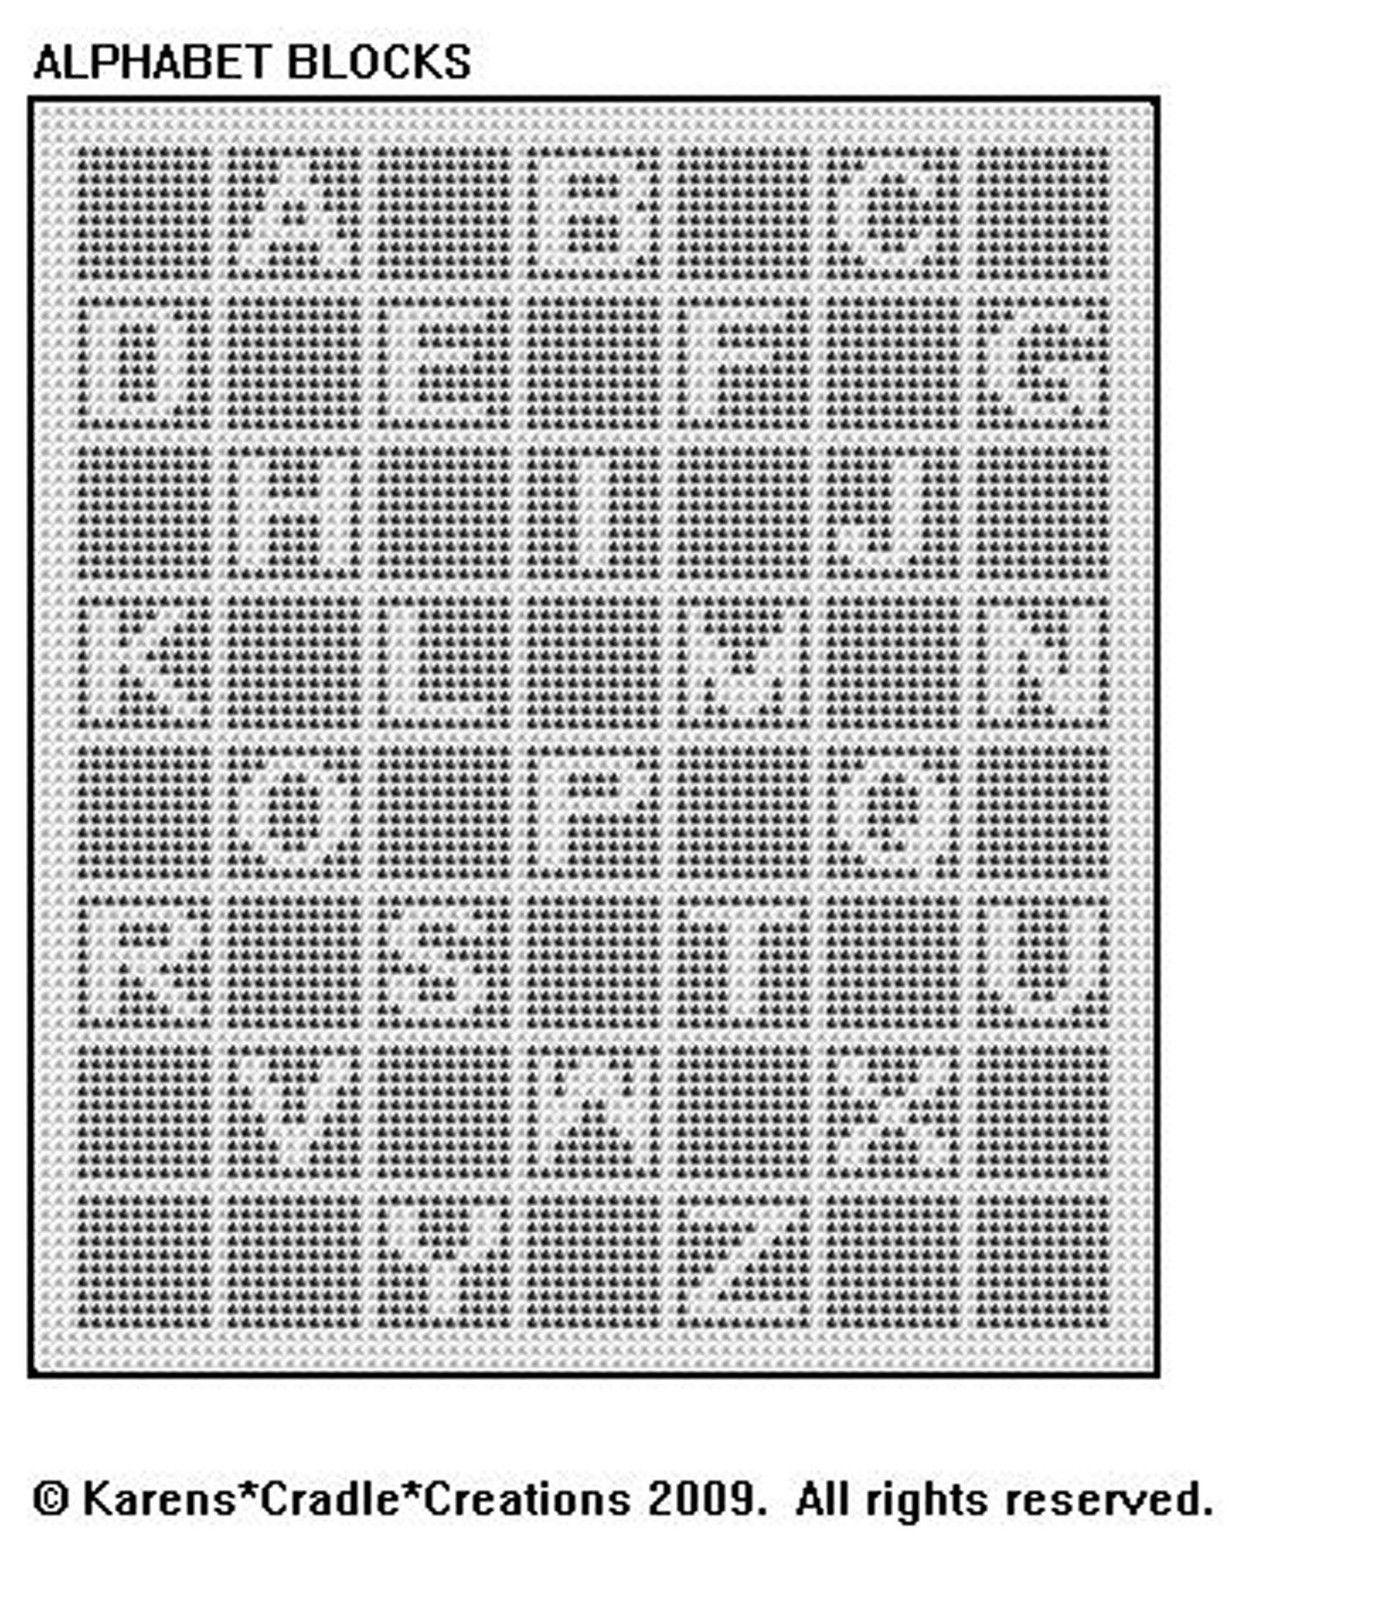 Alphabet Blocks Filet Crochet Afghan/Doily Pattern | Alphabet blocks ...